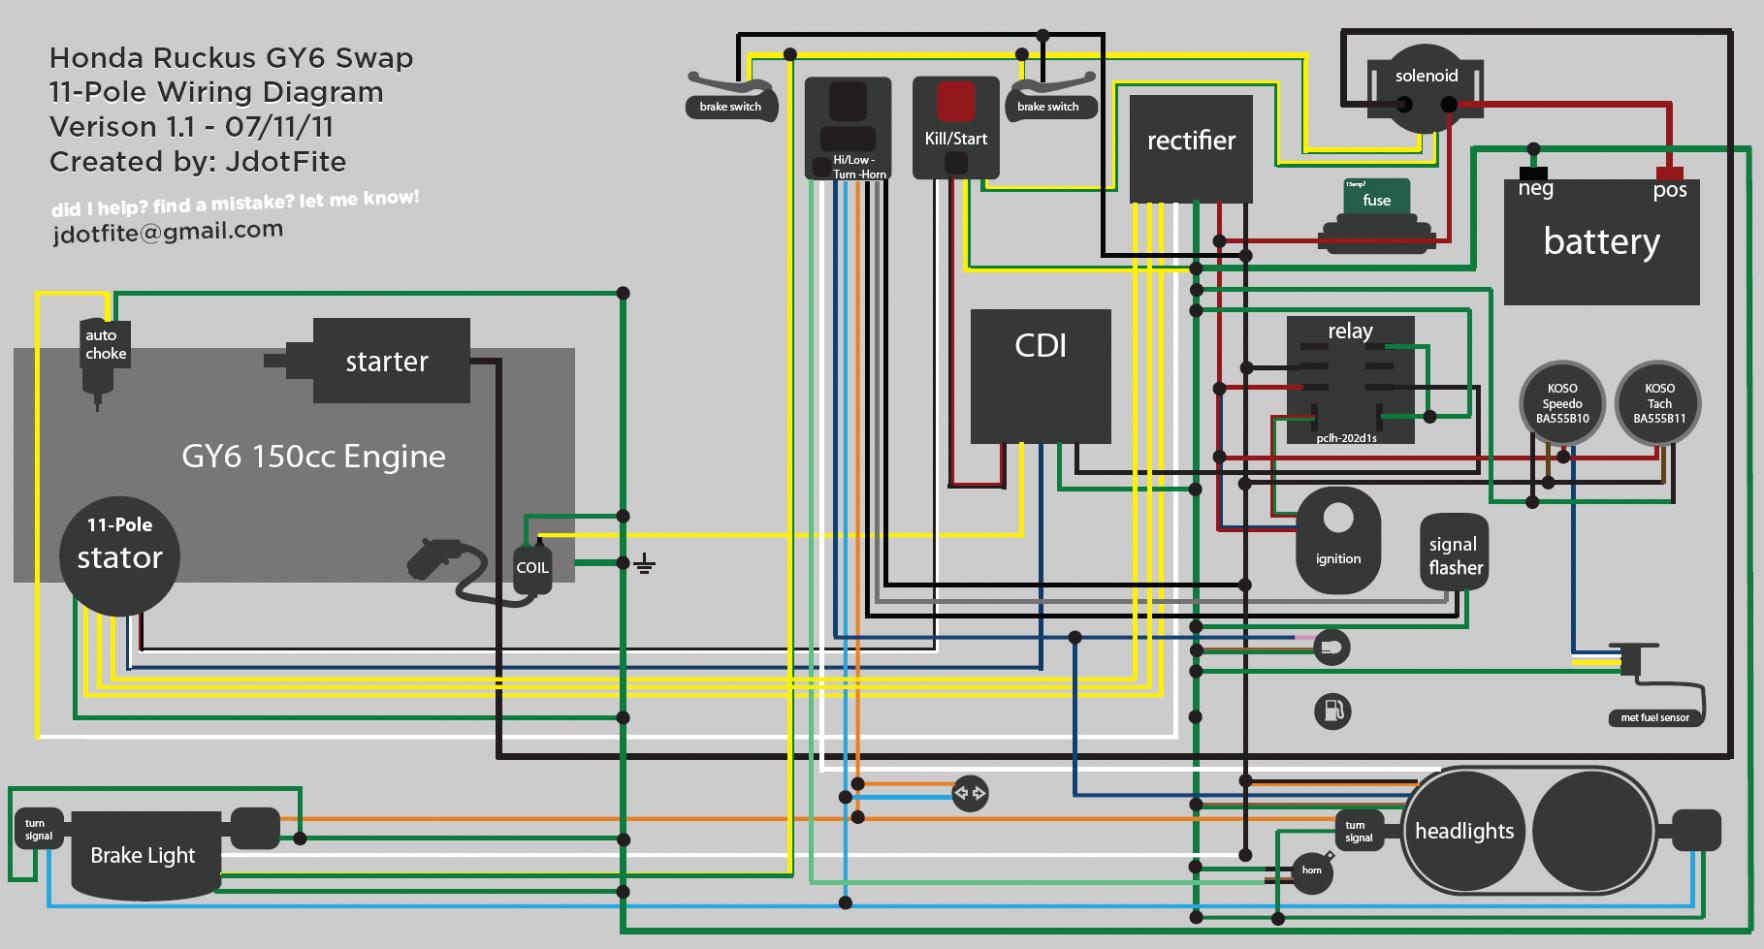 Gy4 4cc Engine Diagram Original Di 2020 Diagram Honda Proposal